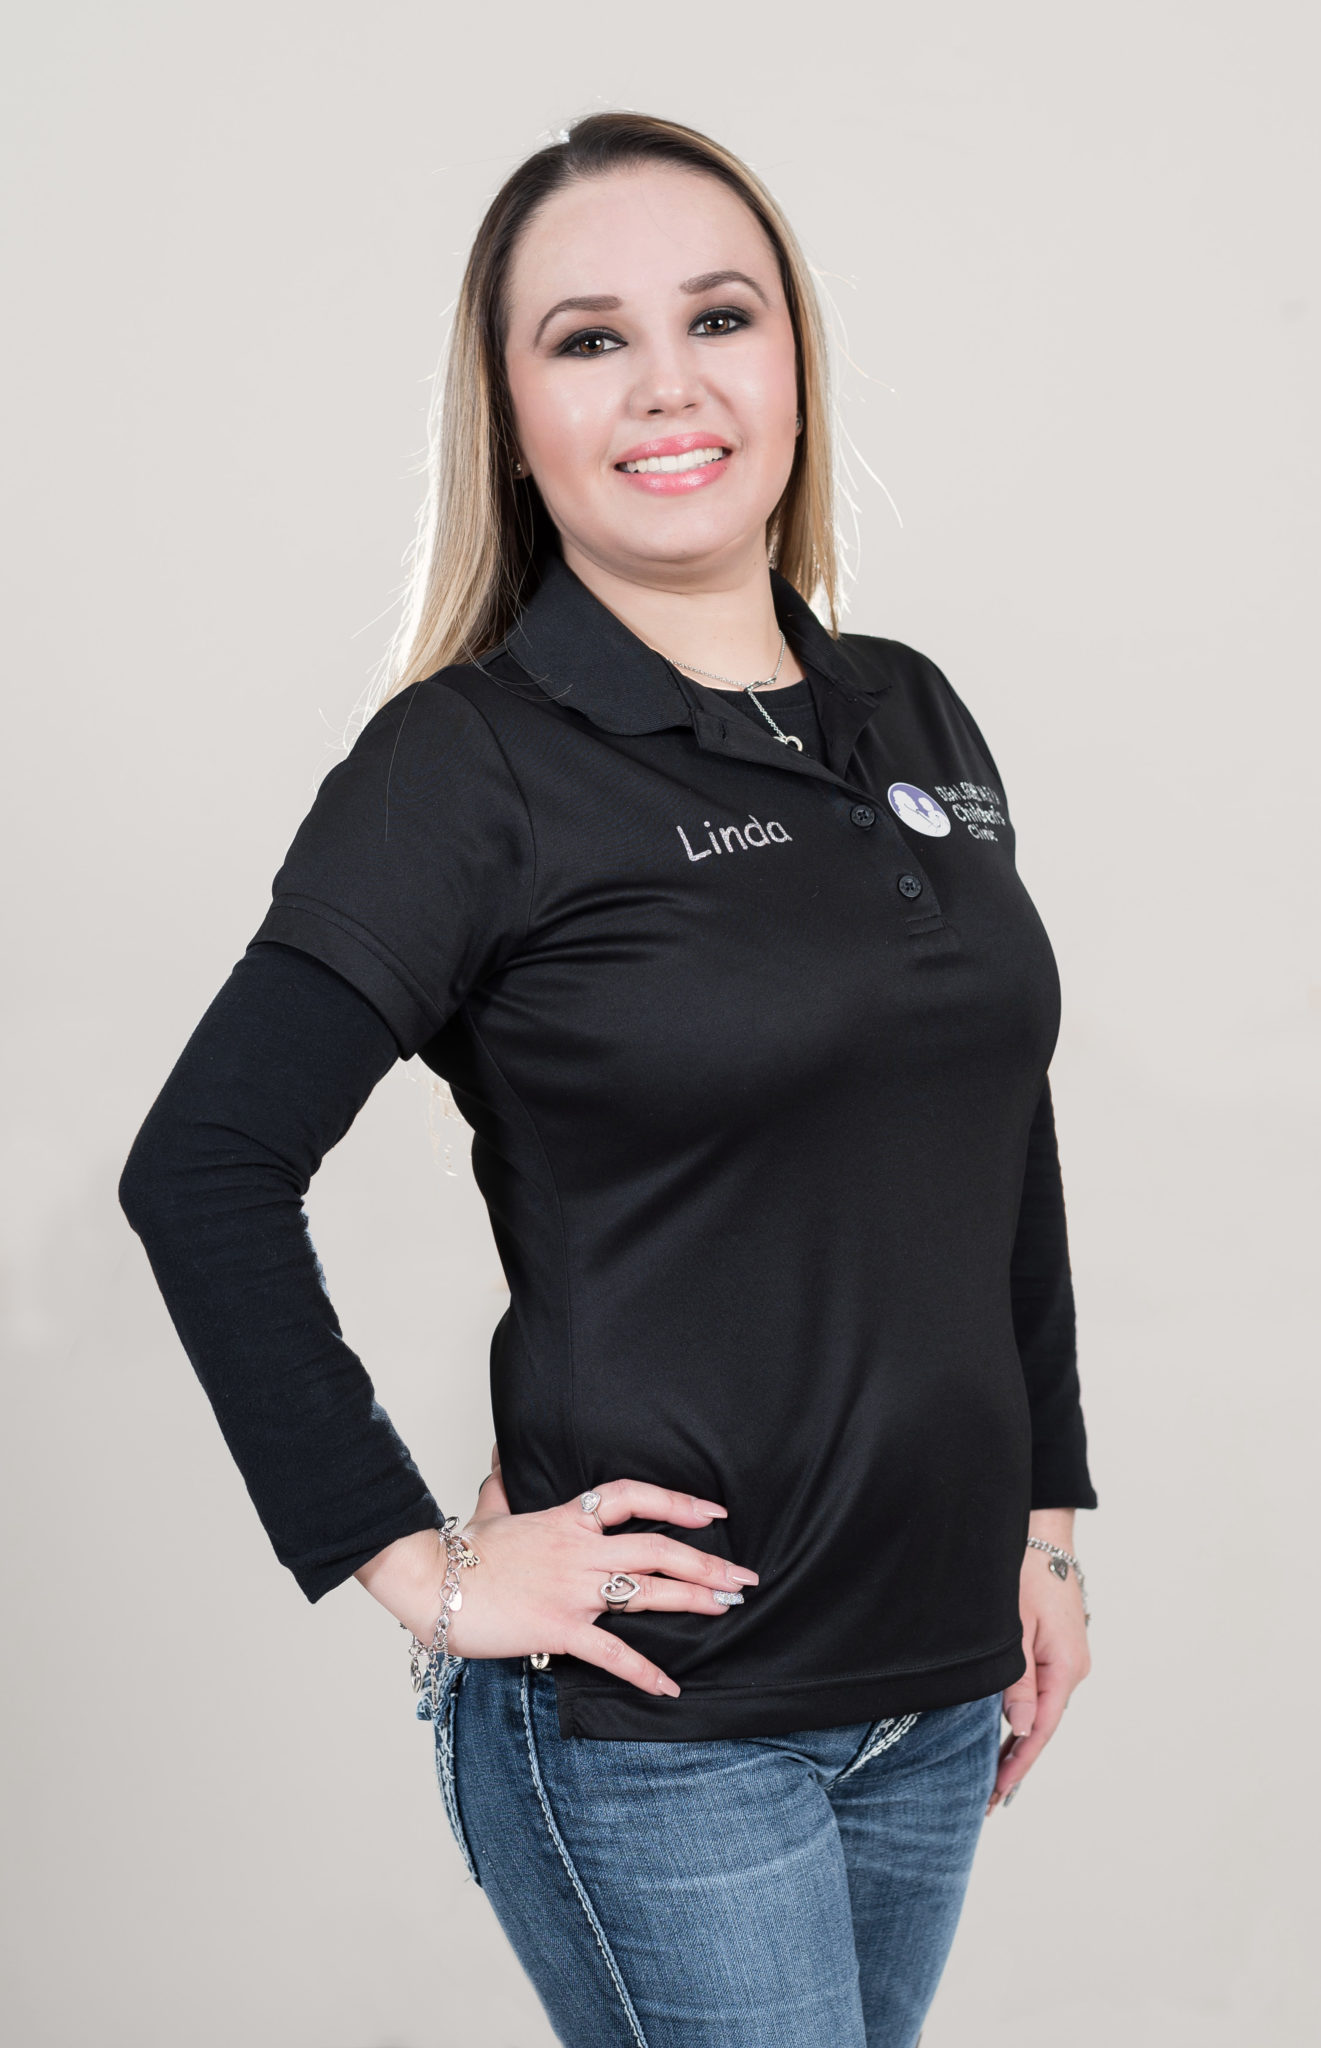 Linda Jimenez